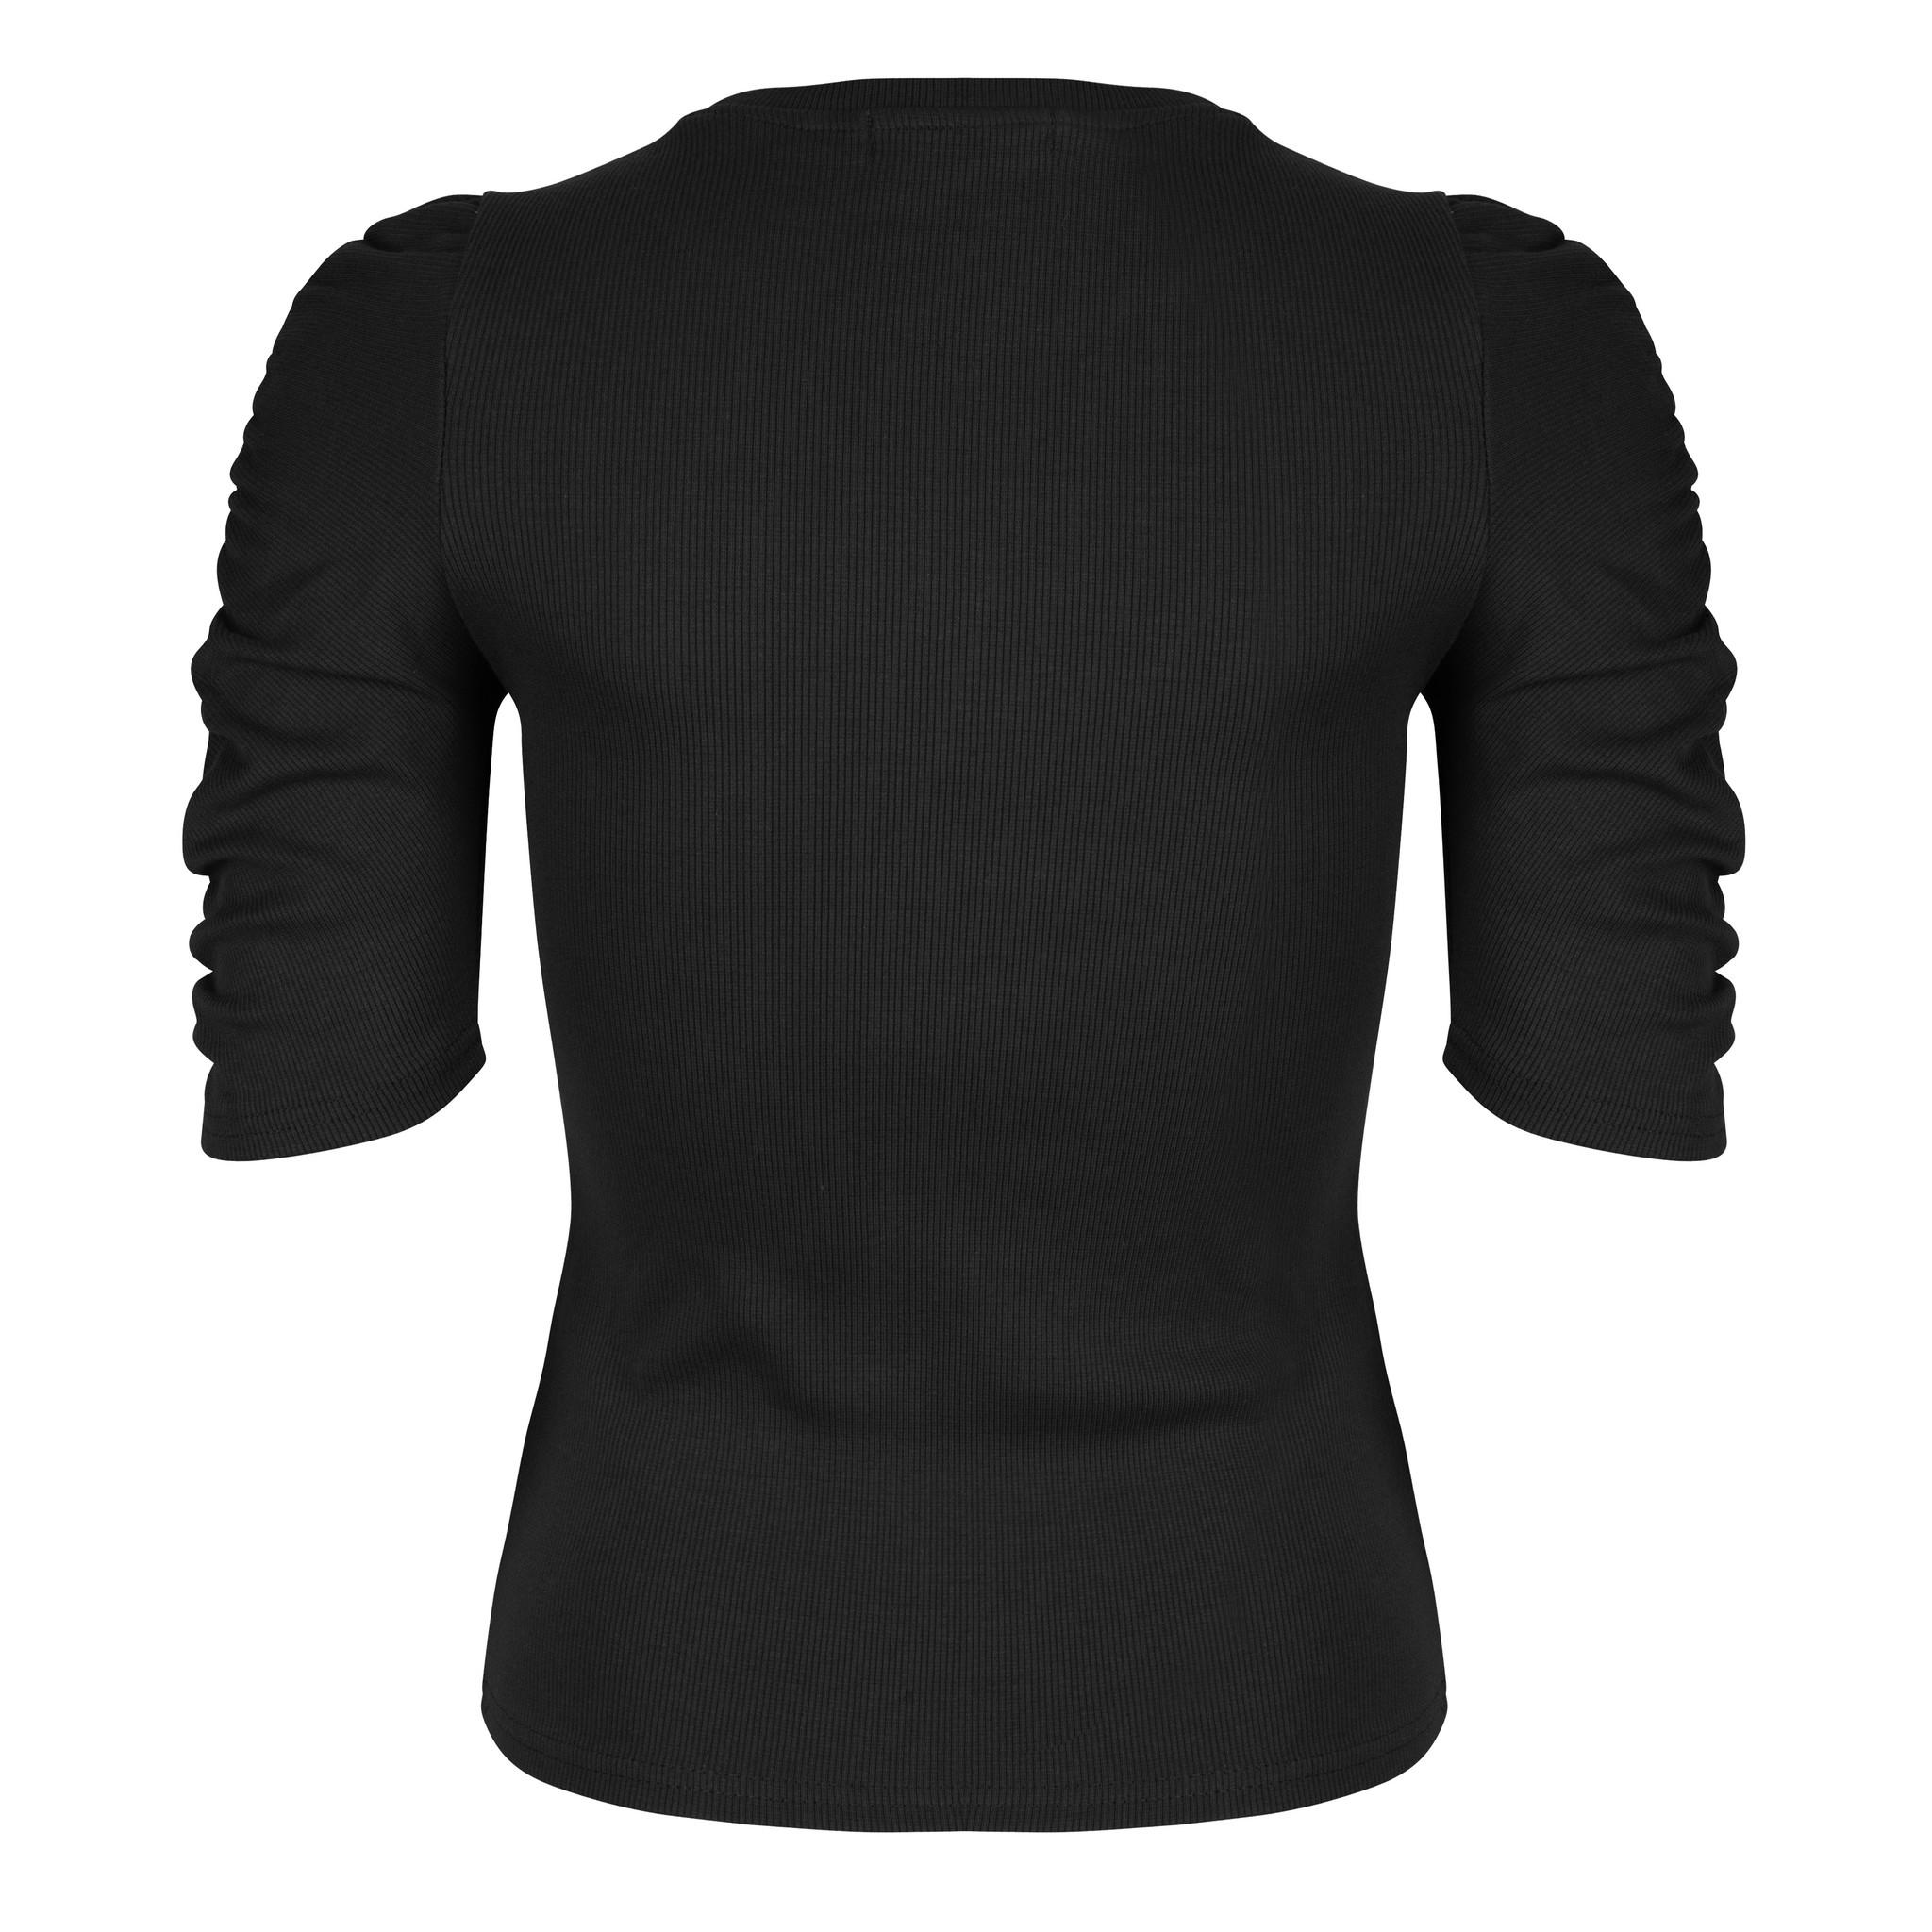 Lofty Manner Black Top Adinda